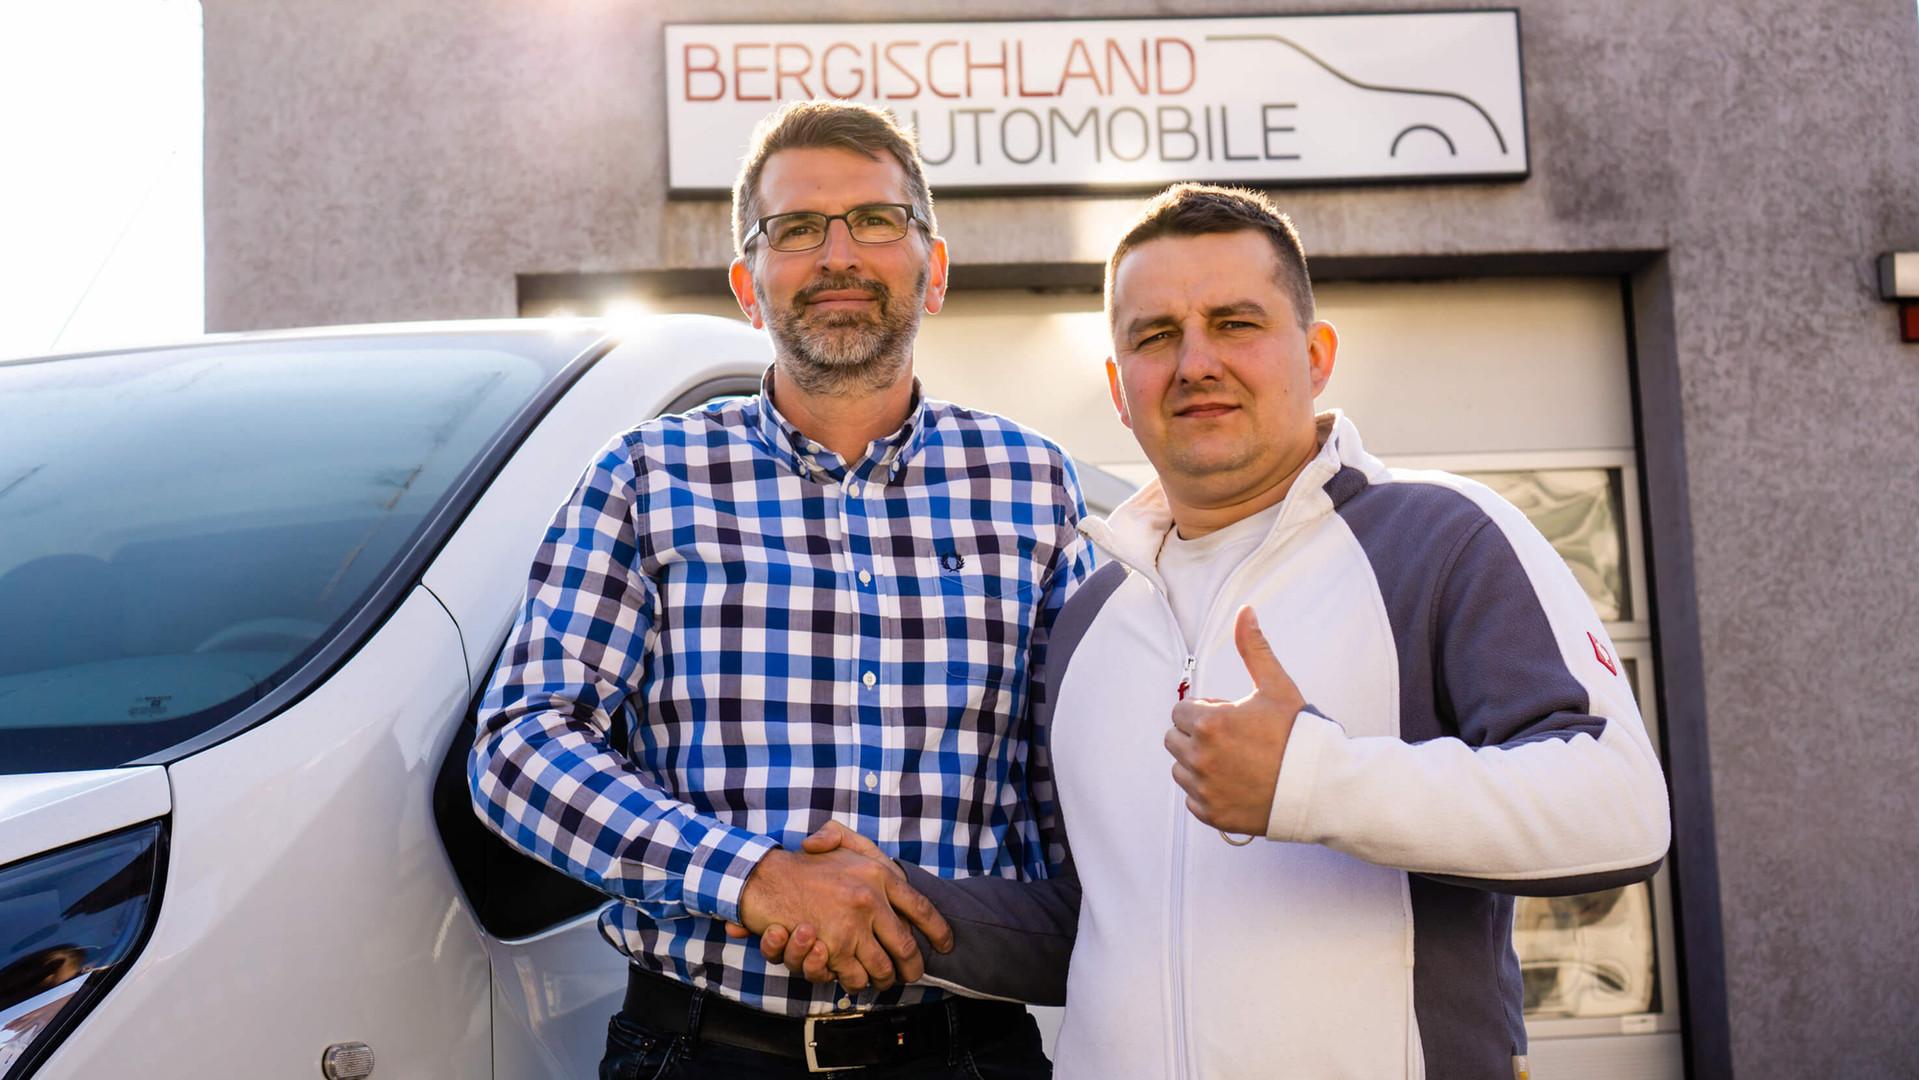 Bergischland Automobile-37.jpg